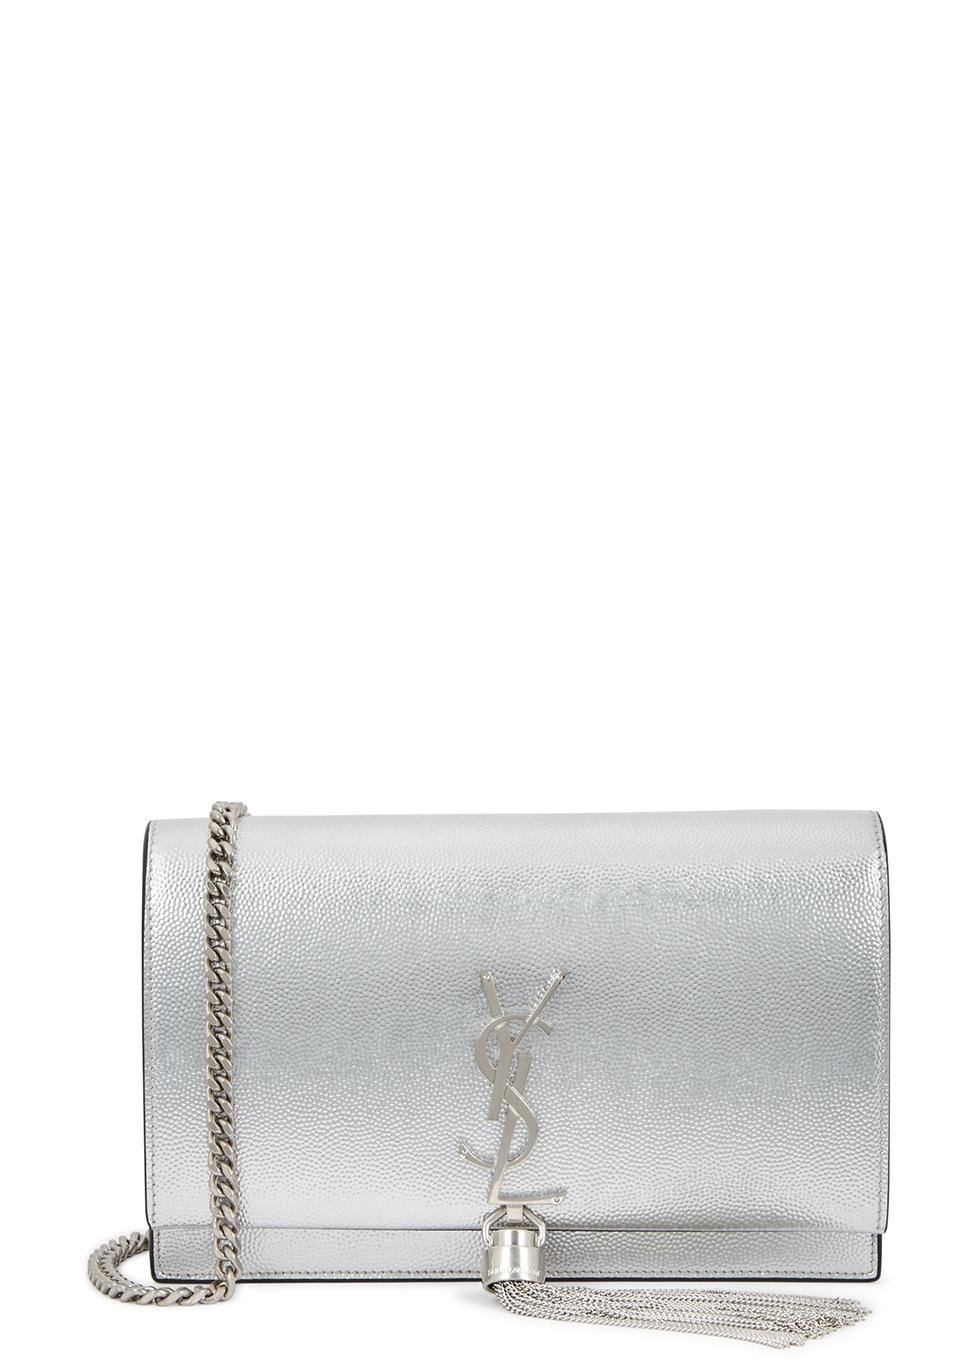 Nichols Clutches Harvey Box Designer Leather amp; Women's 5OzqSAYY